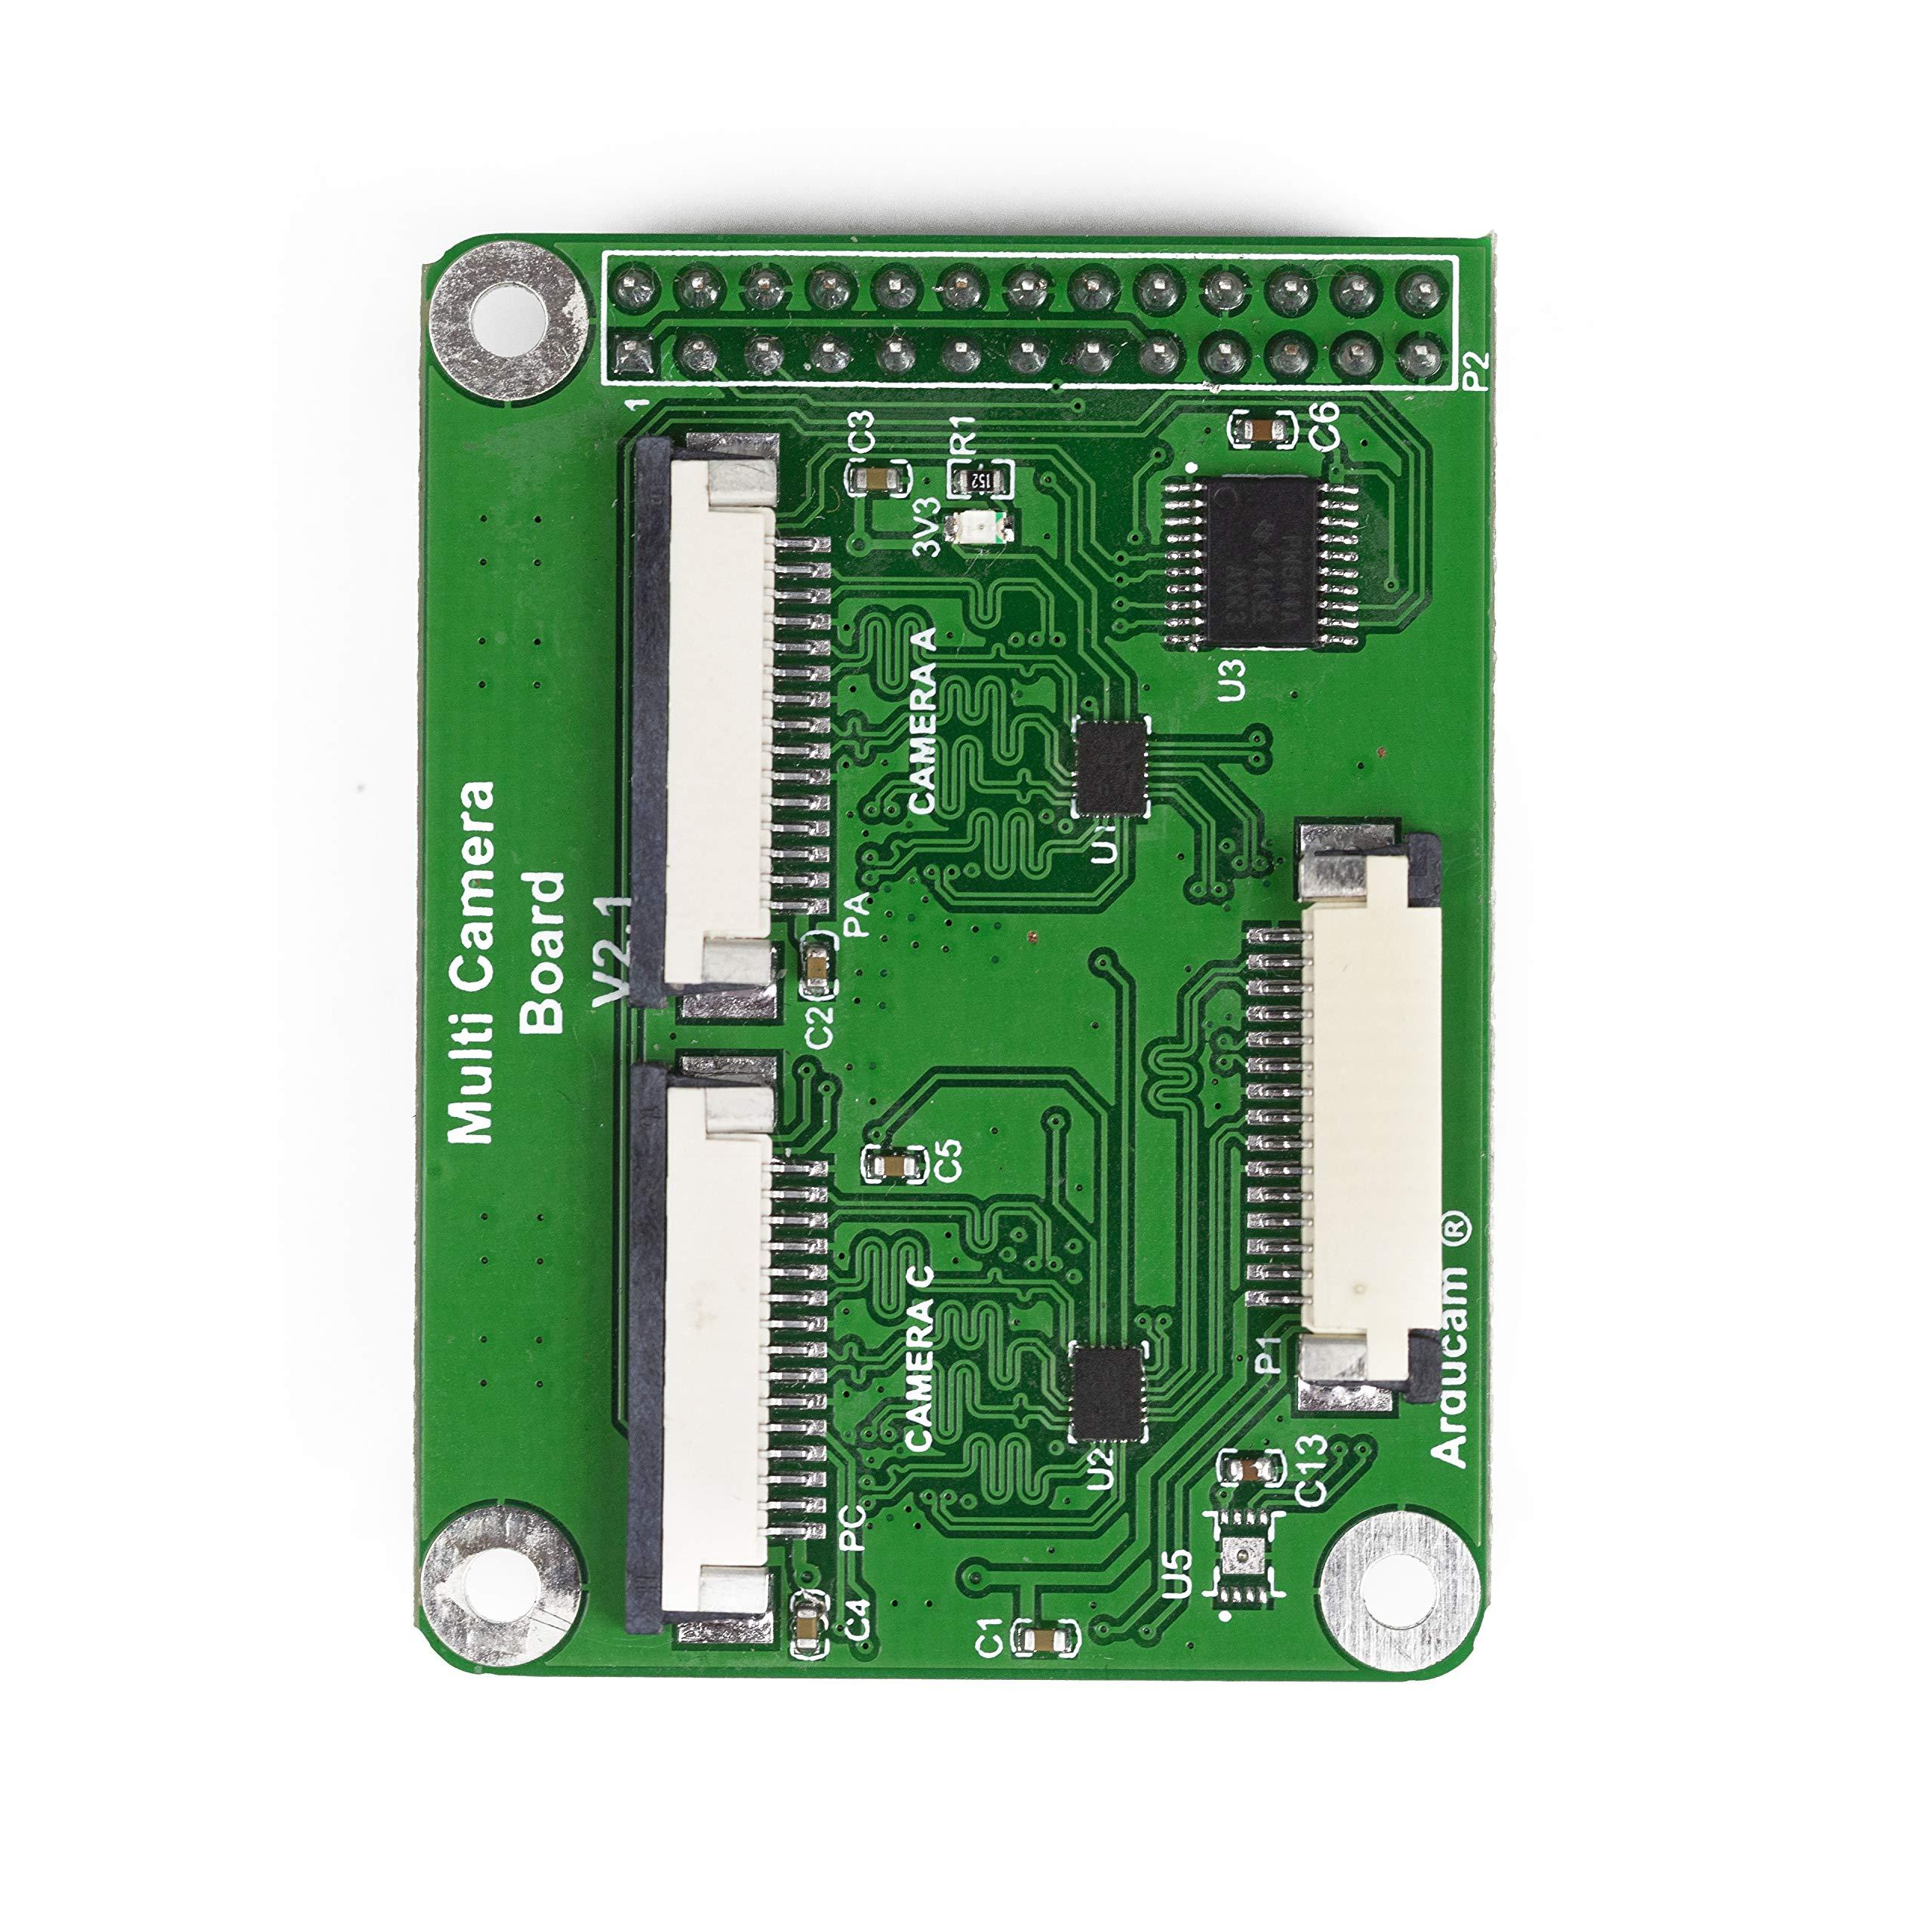 Arducam Multi Camera Adapter Module V2.1 for Raspberry Pi 3B+, Pi 3, Pi 2, Model A/B/B+, Work with 5MP or 8MP Cameras